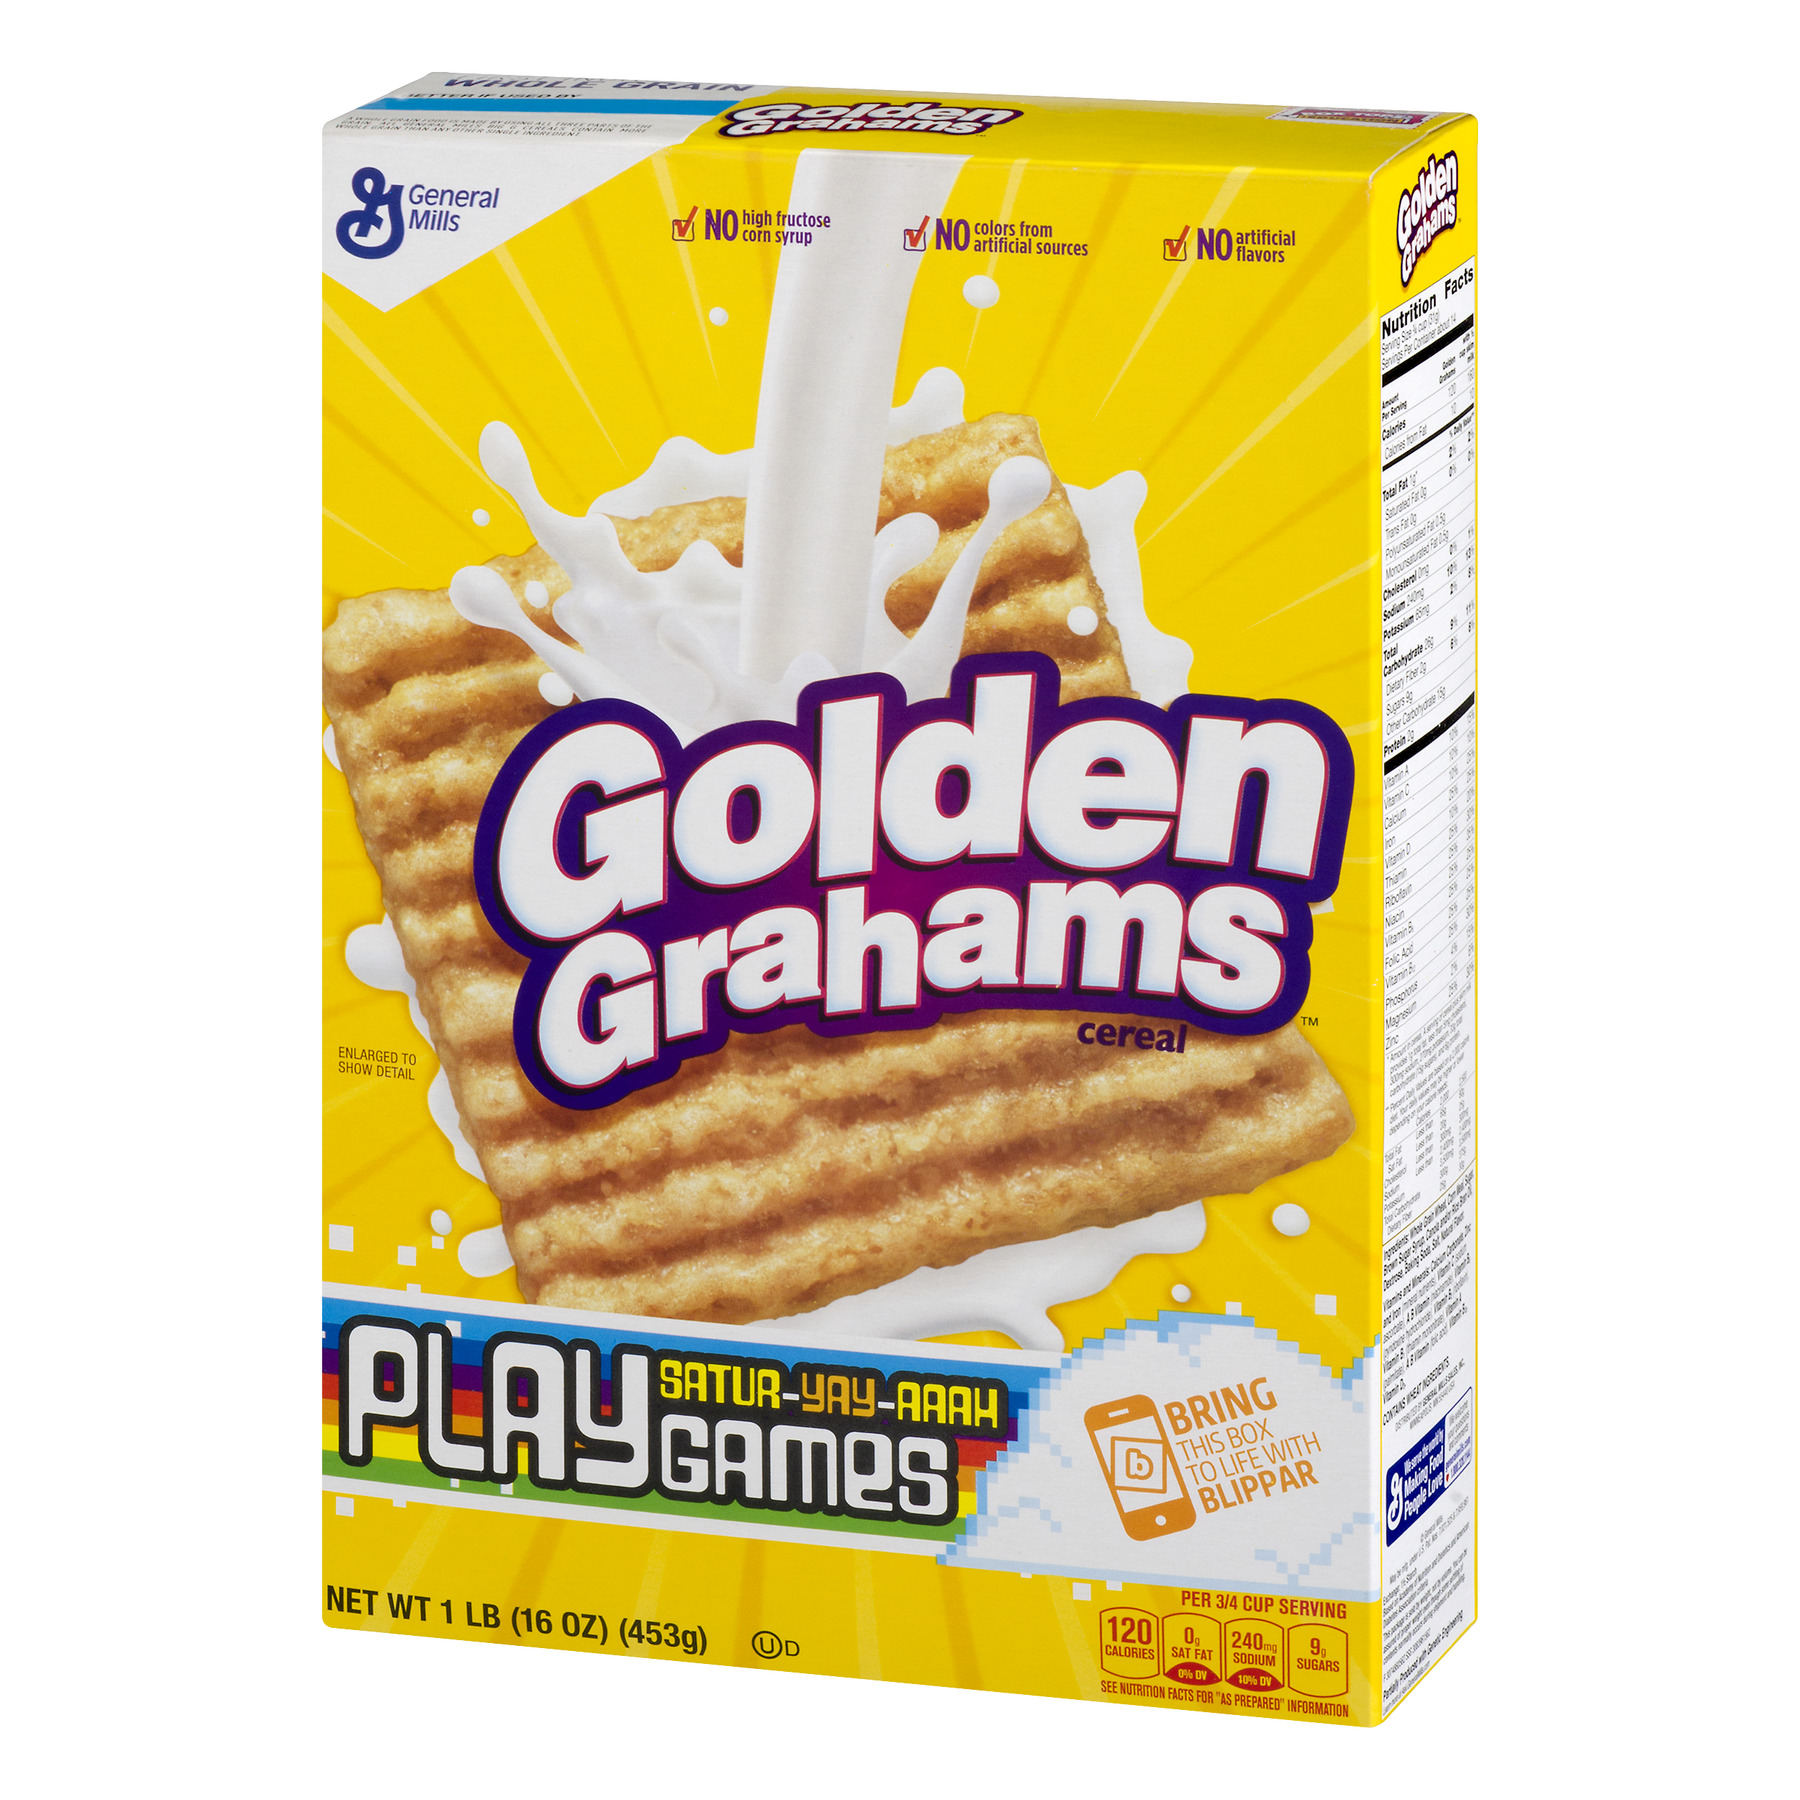 Golden Grahams Nutrition Facts Label